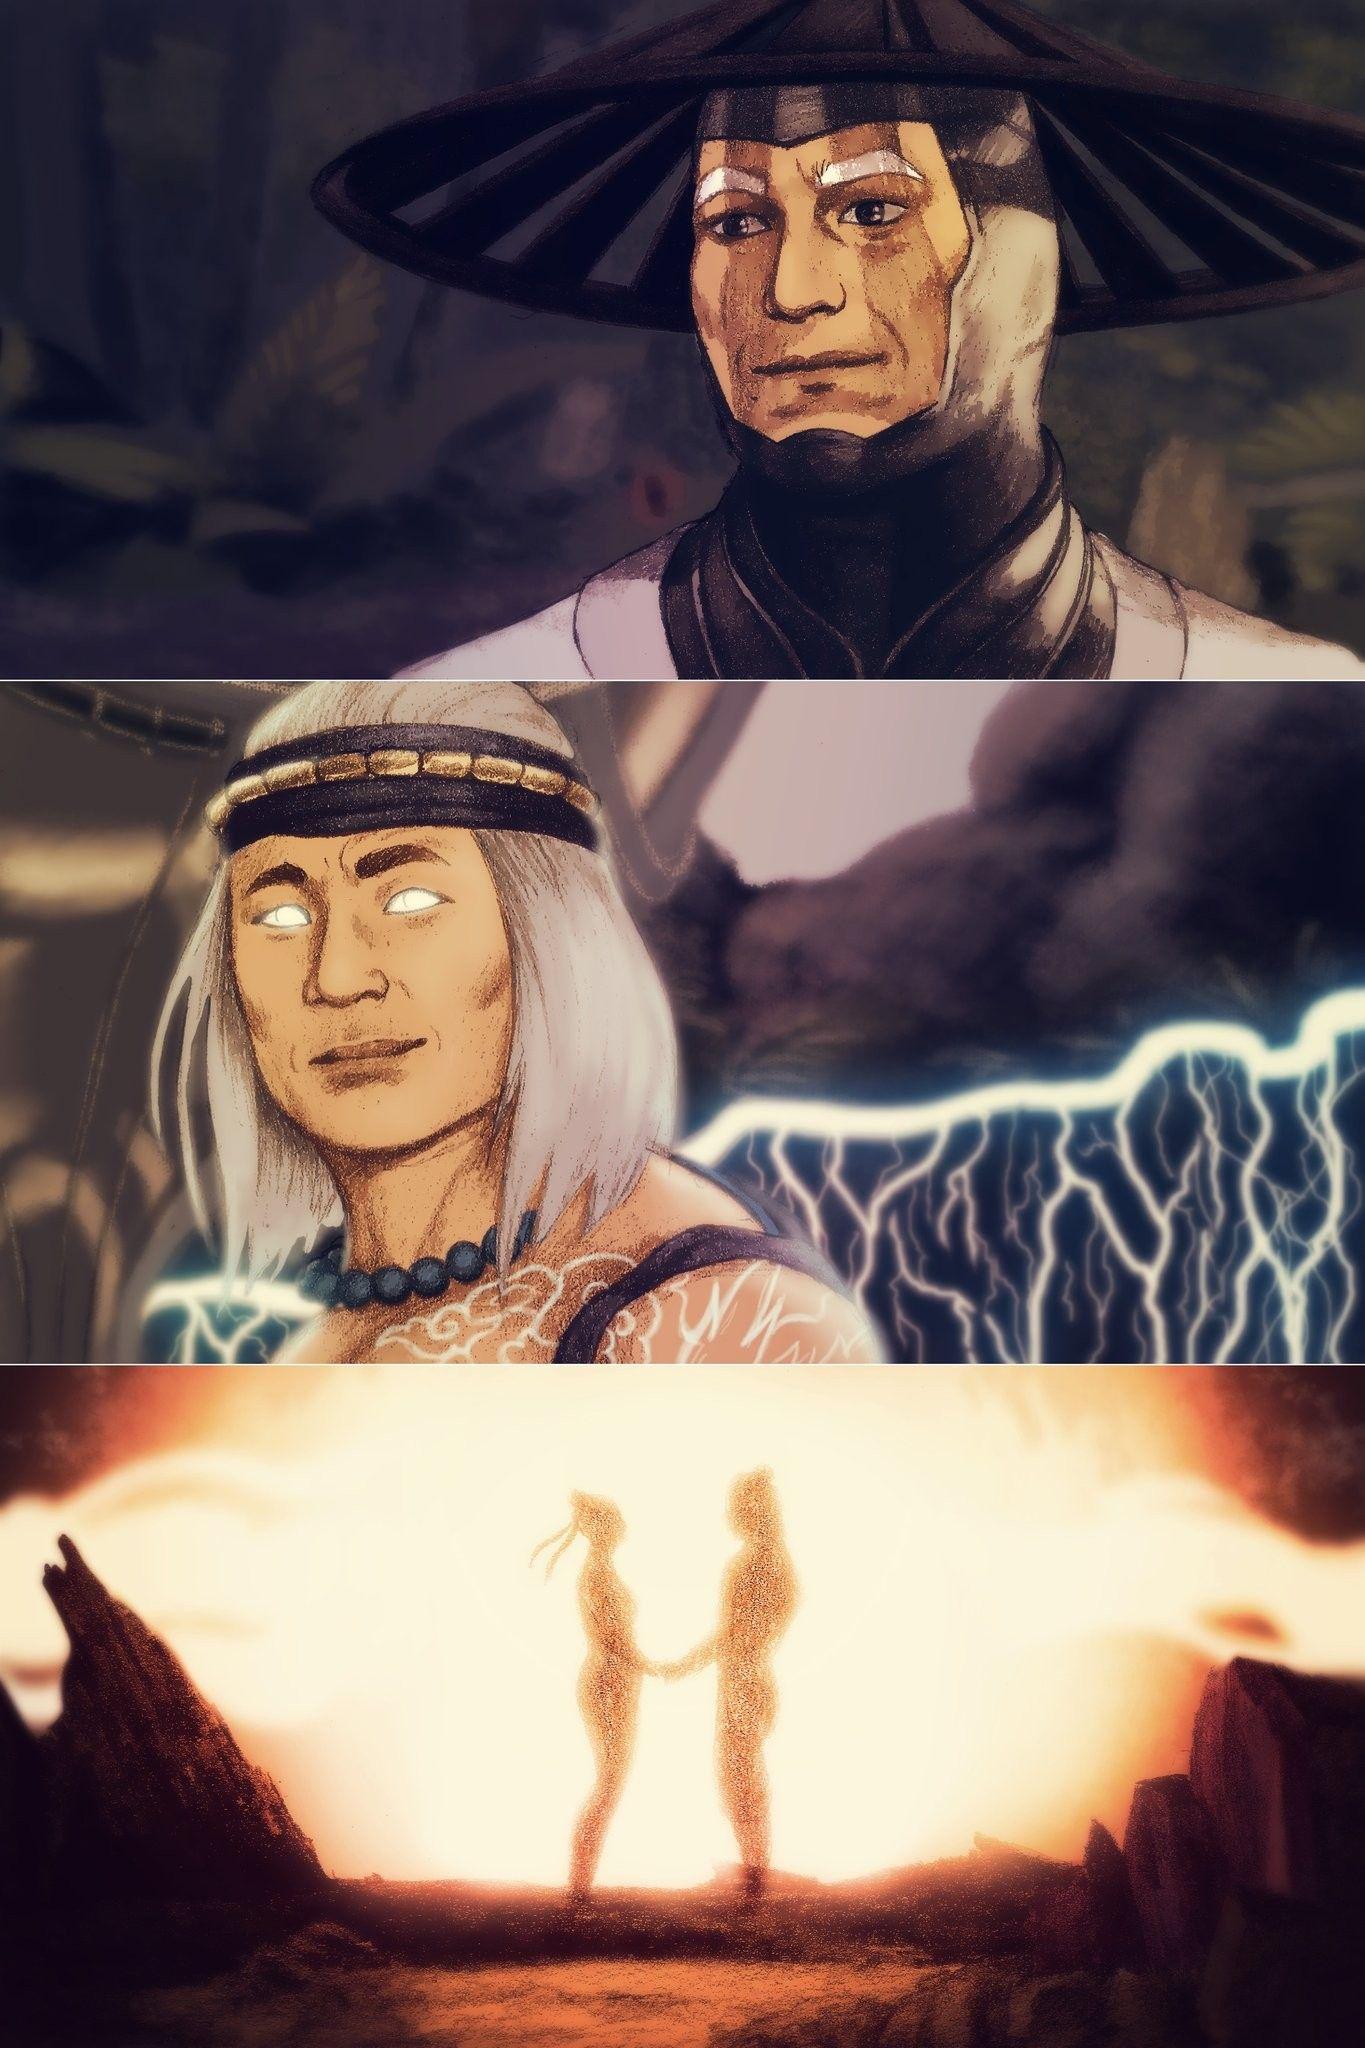 Pin De Lashaunlyde Em Mortal Kombat 11 Liu Kang Mortal Combate Desenho Mortal Kombat